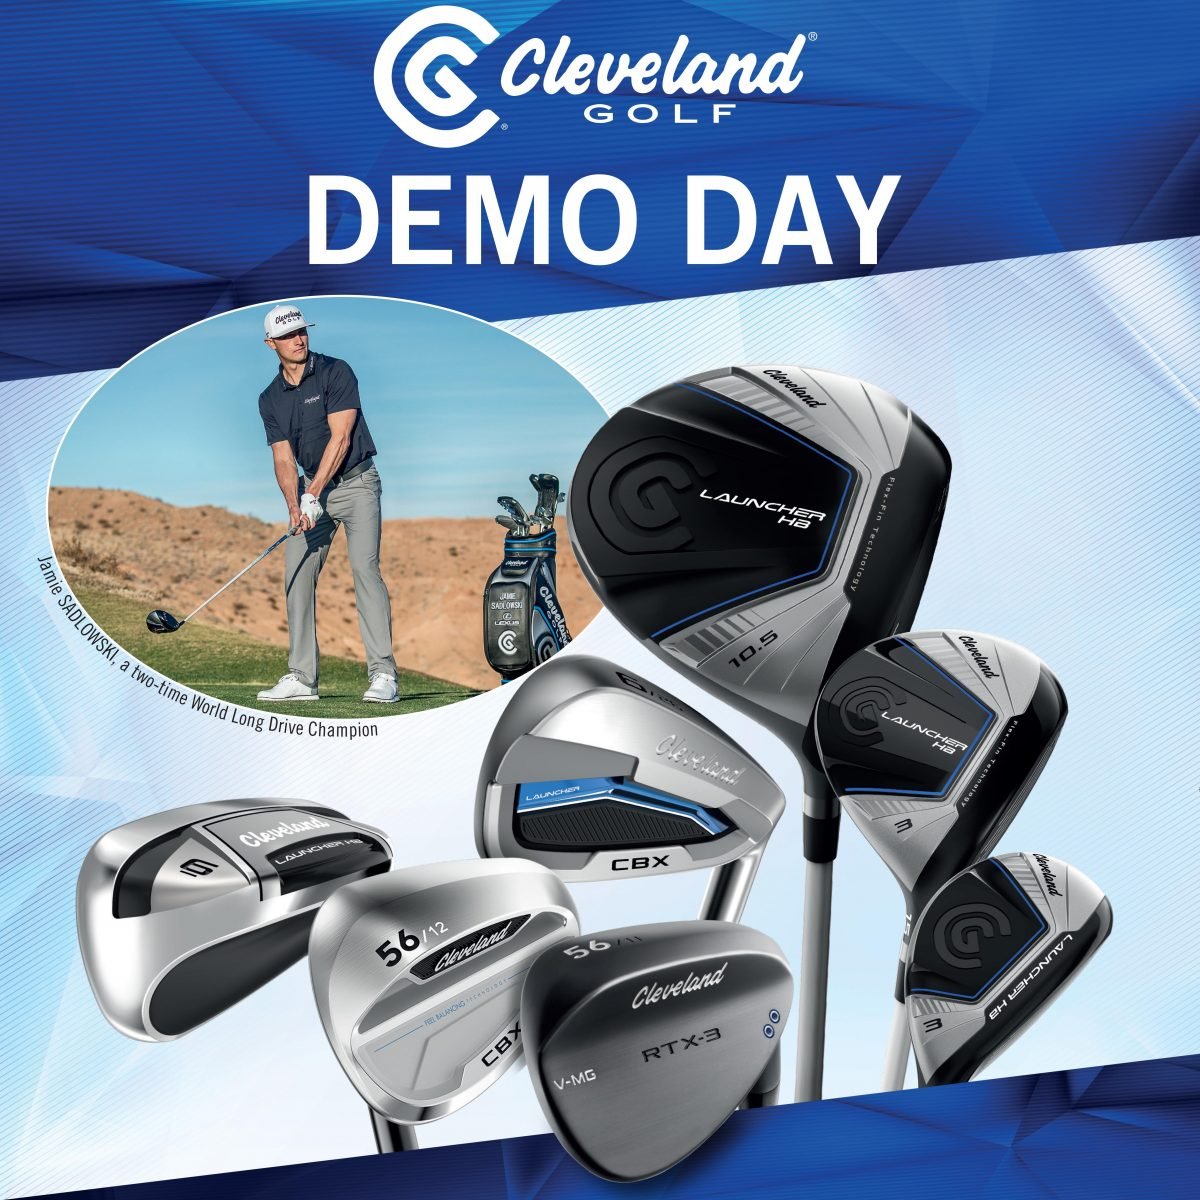 Demo Day Srixon Cleveland